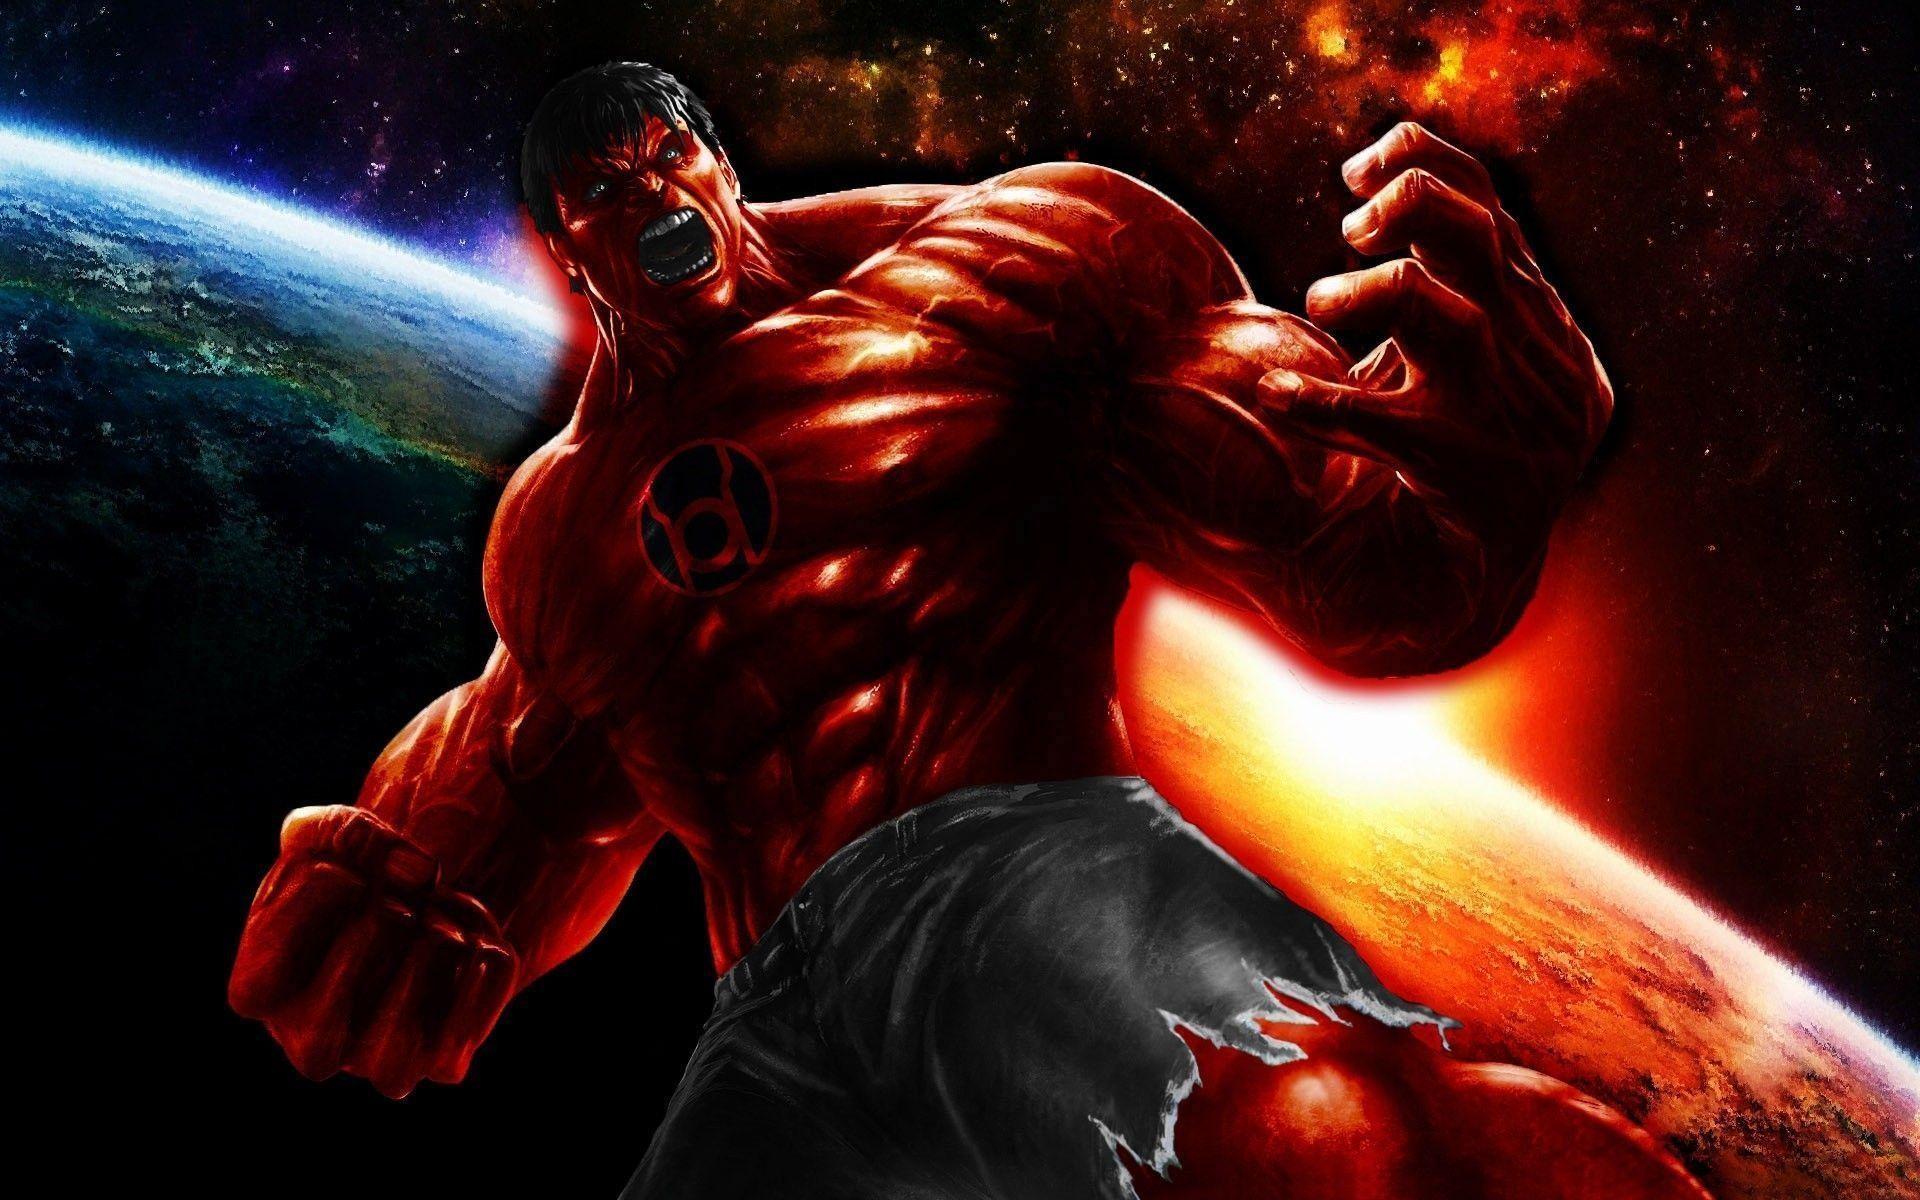 Res: 1920x1200, Hulk Wallpaper Hd: Red Hulk Marvel Comics Hd Wallpaper Shoutotcom .